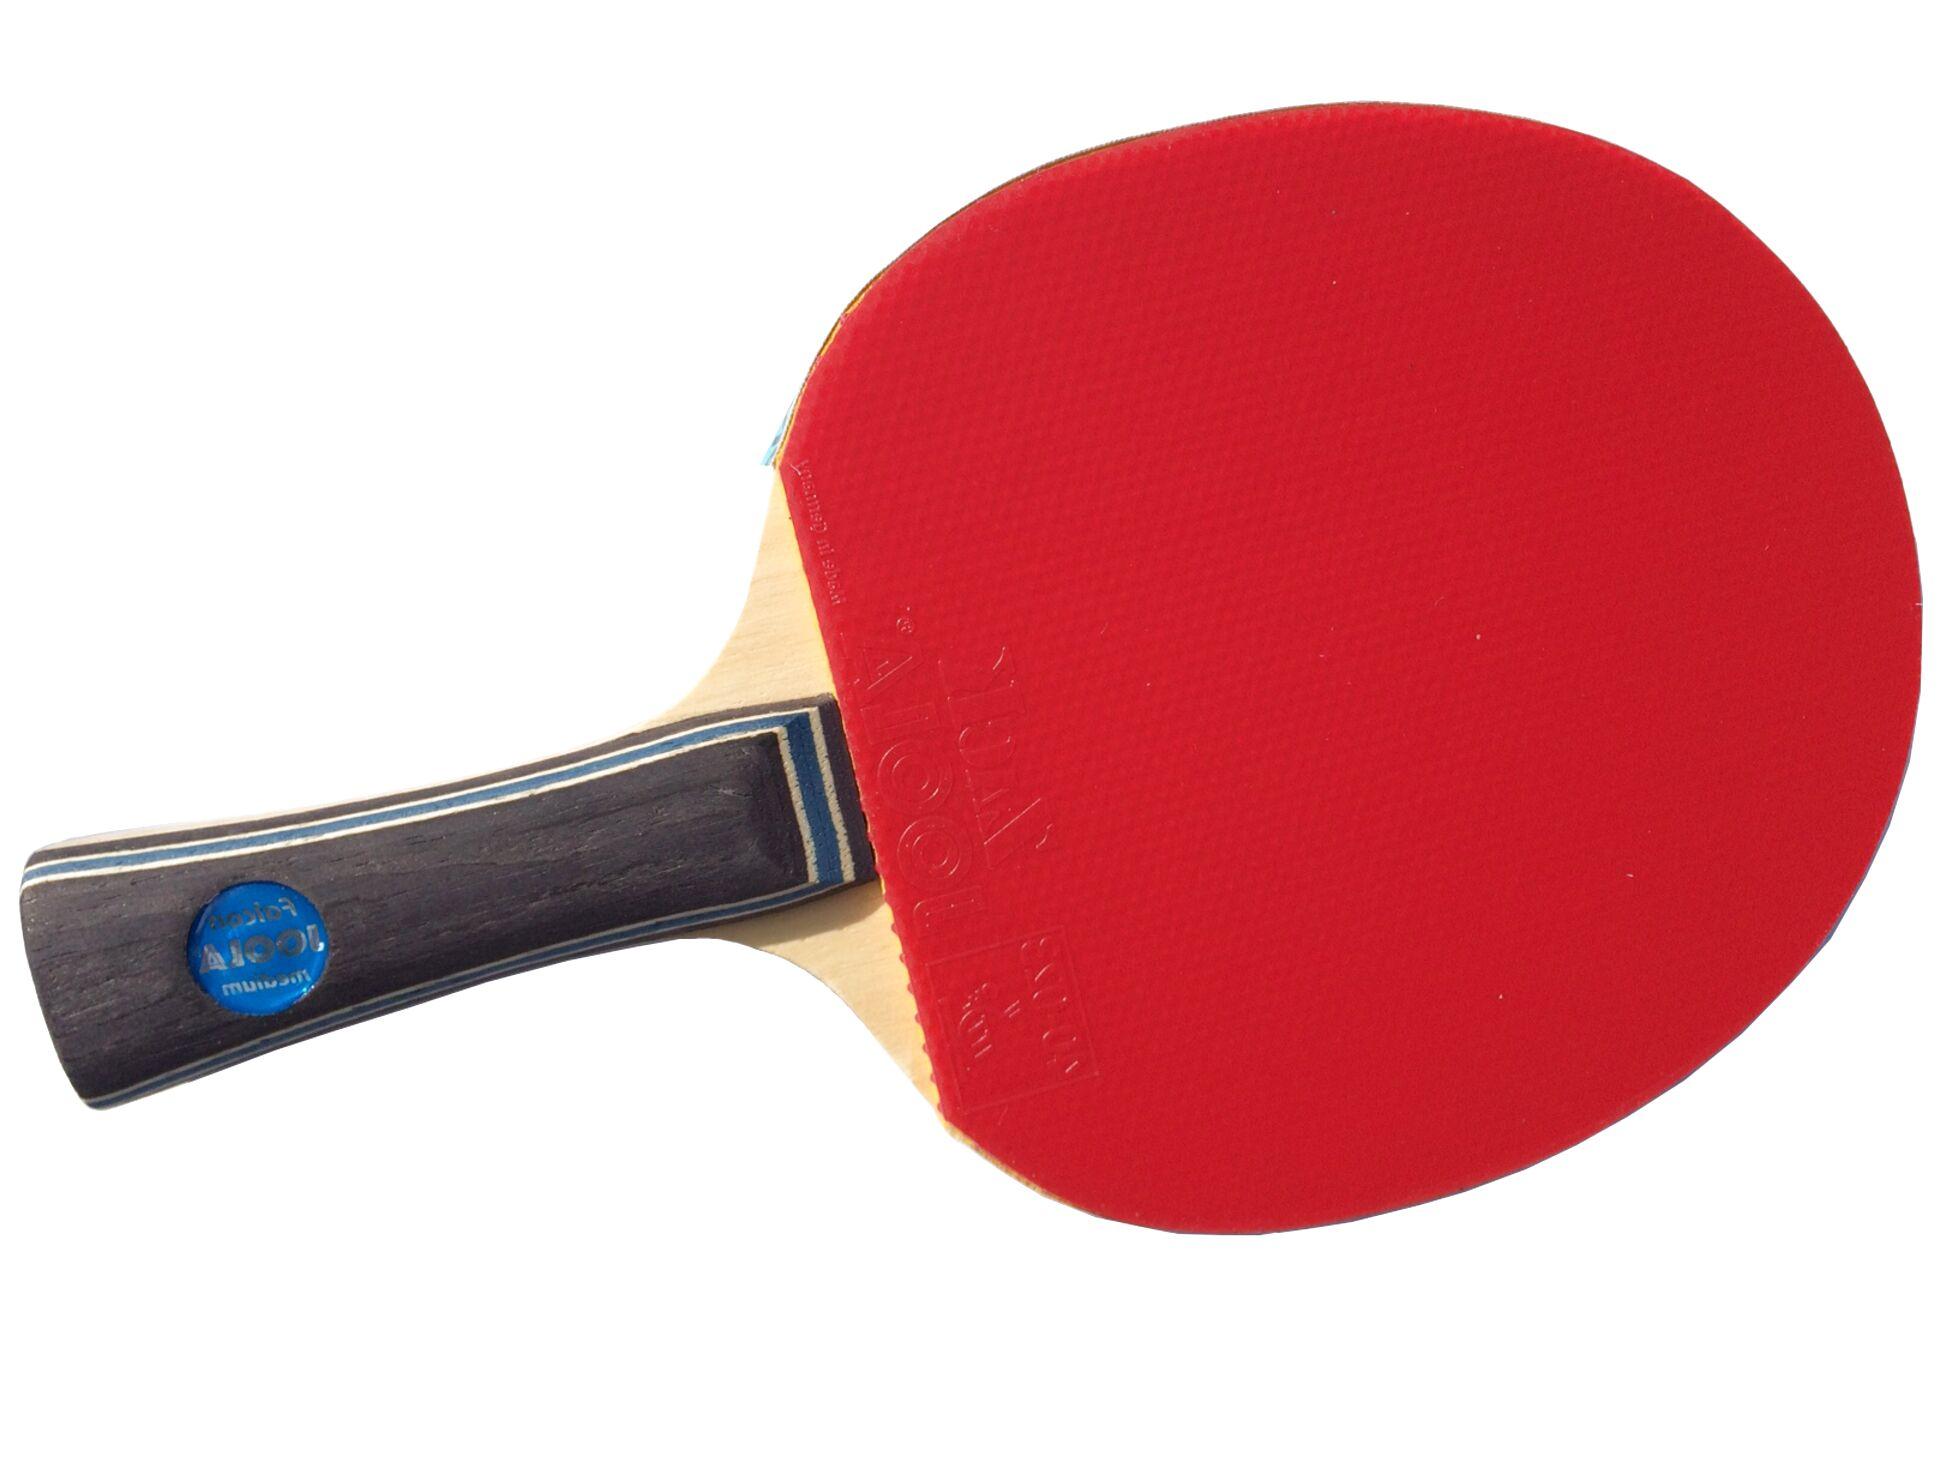 table tennis bats for sale